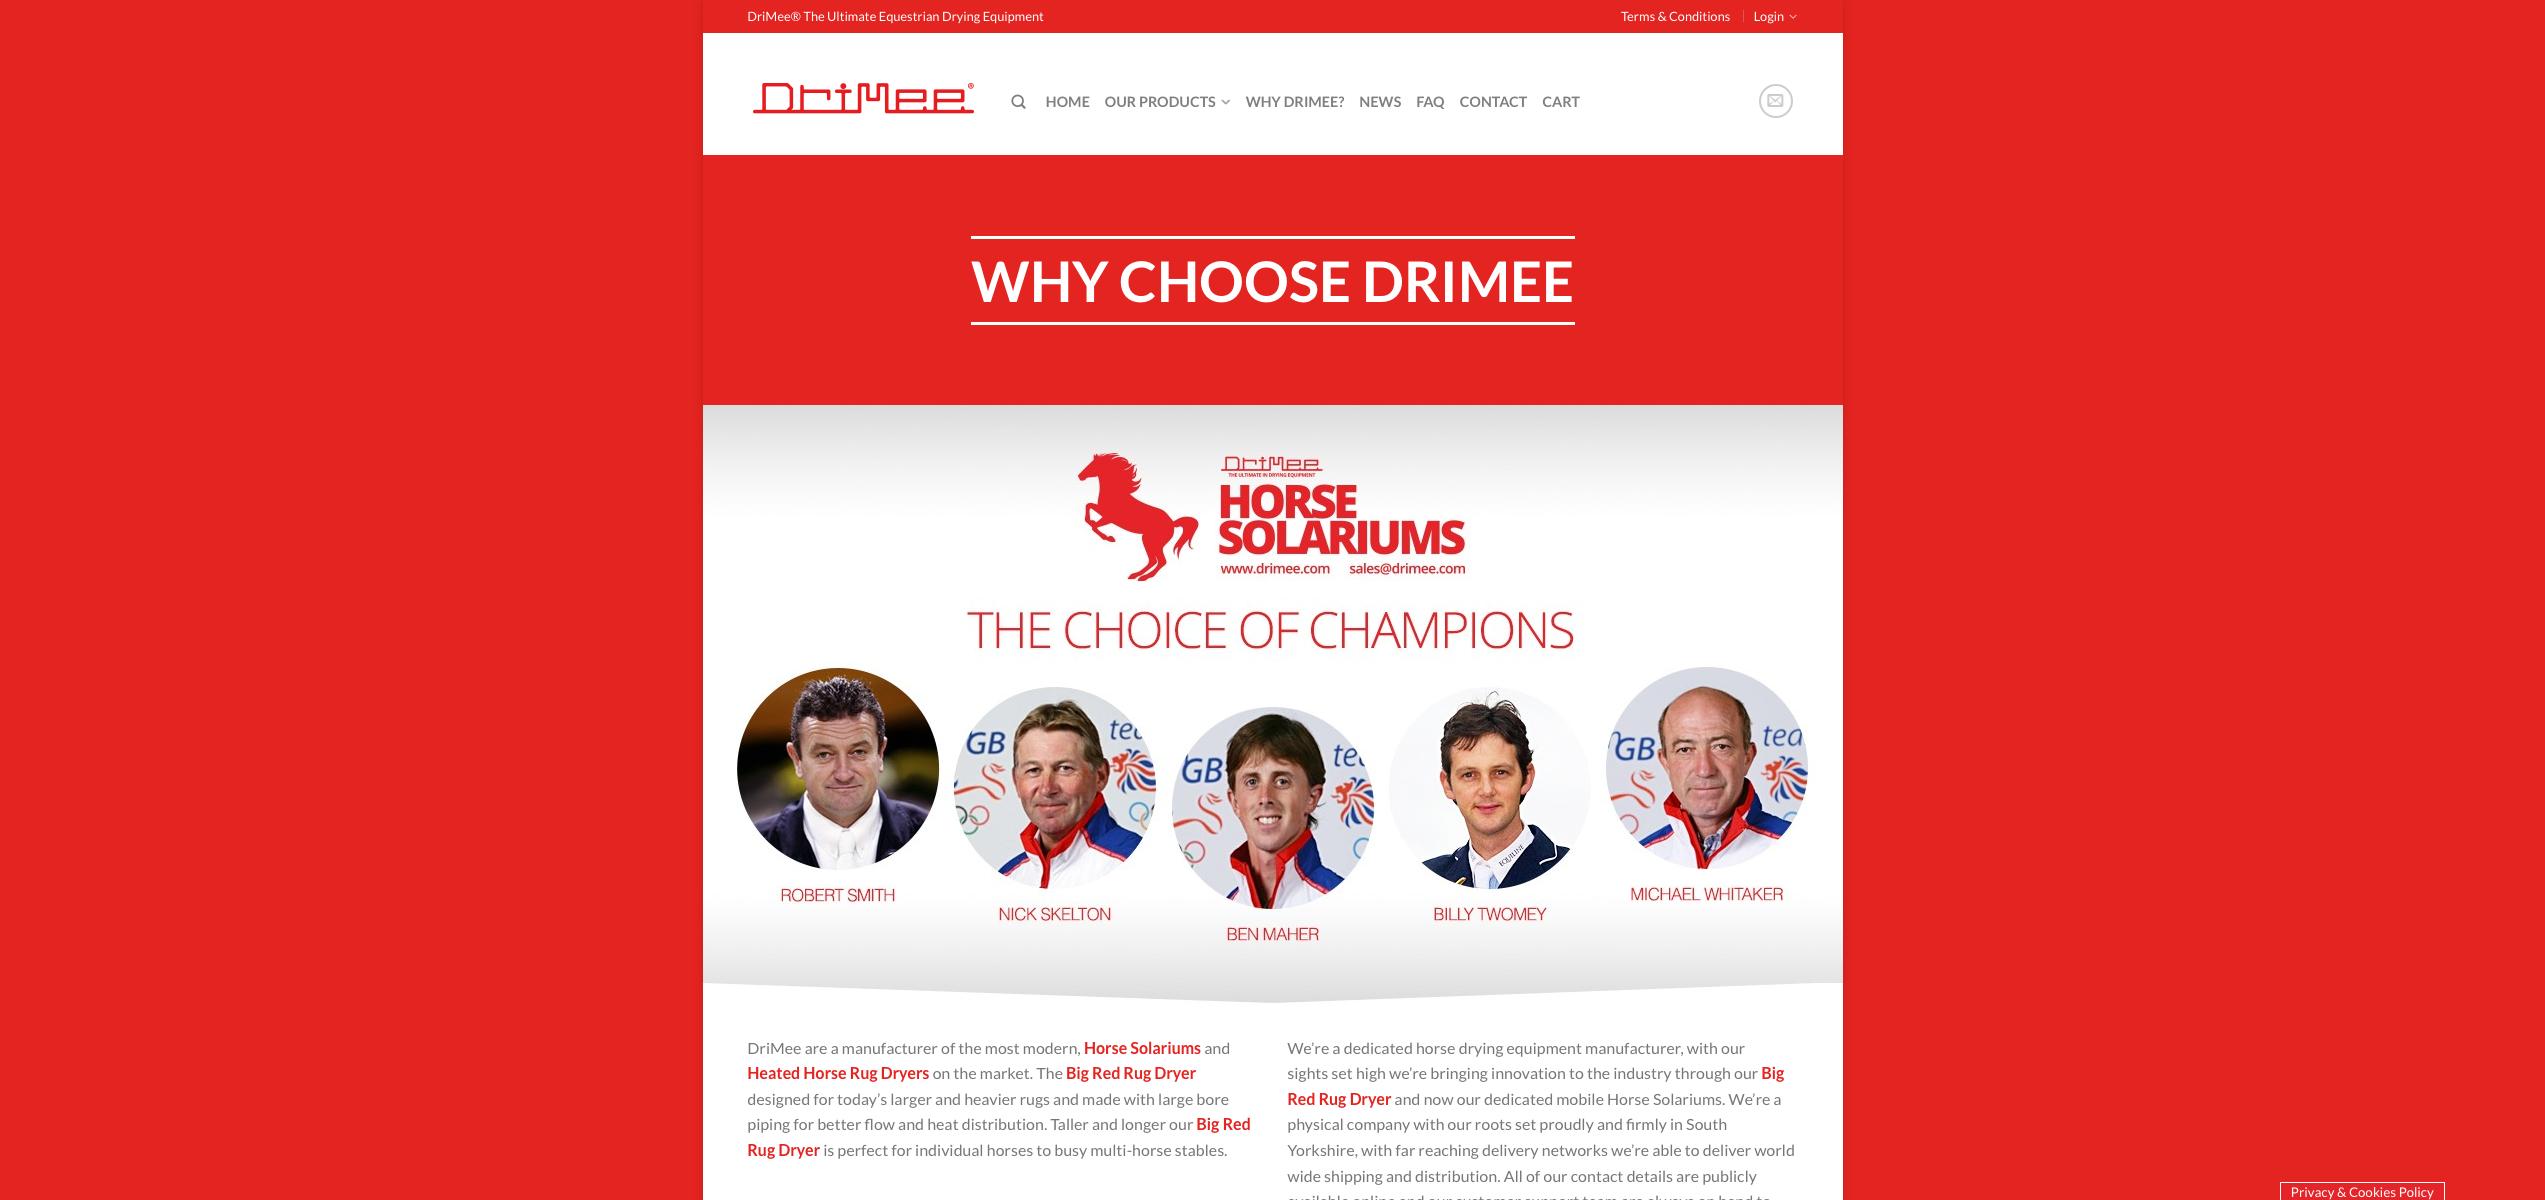 IDEA UK Design and Marketing Drimee Equestrian Horse Equipment Website Design 13